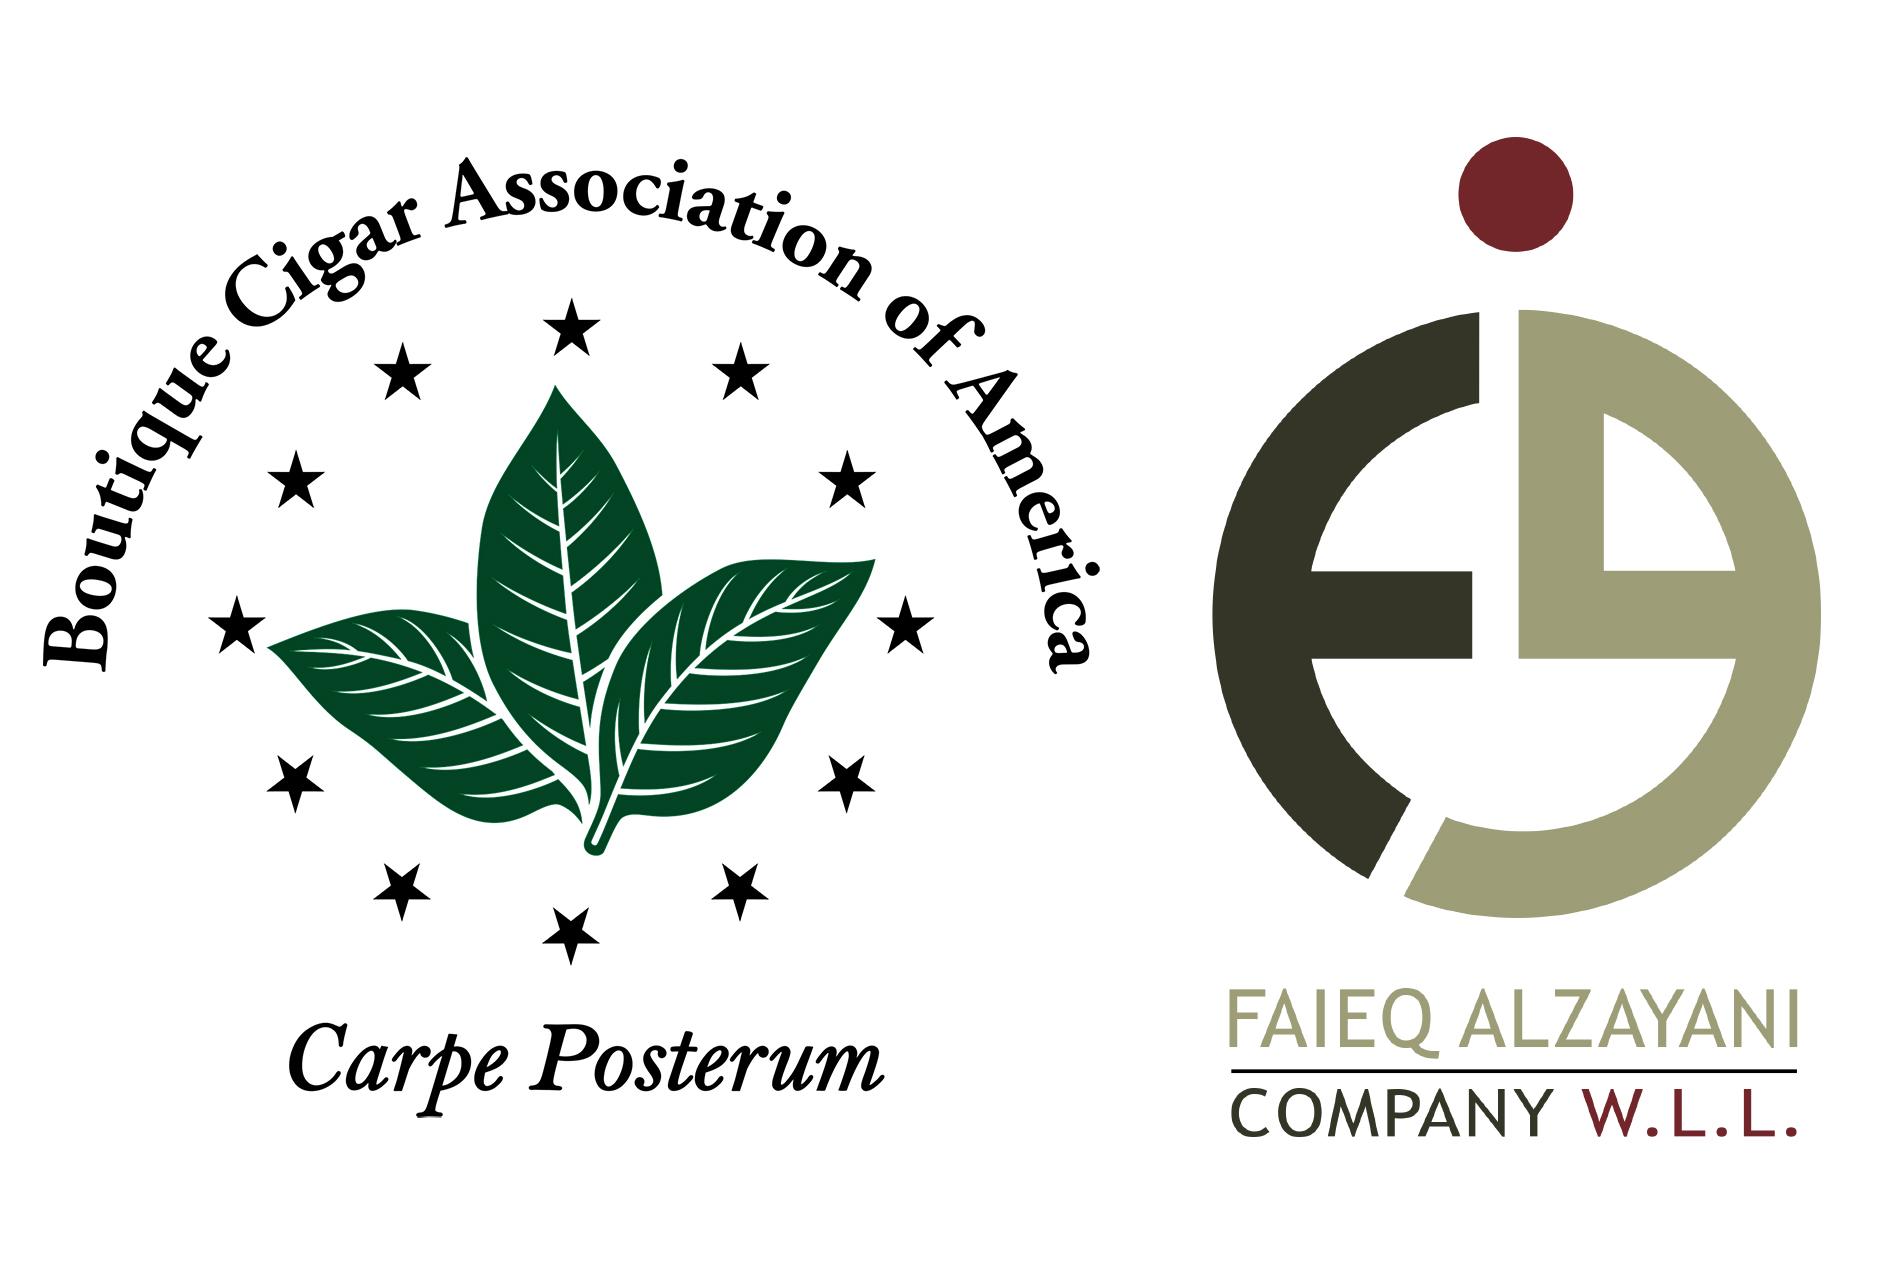 Boutique Cigar Association of America Partners with FAZCO